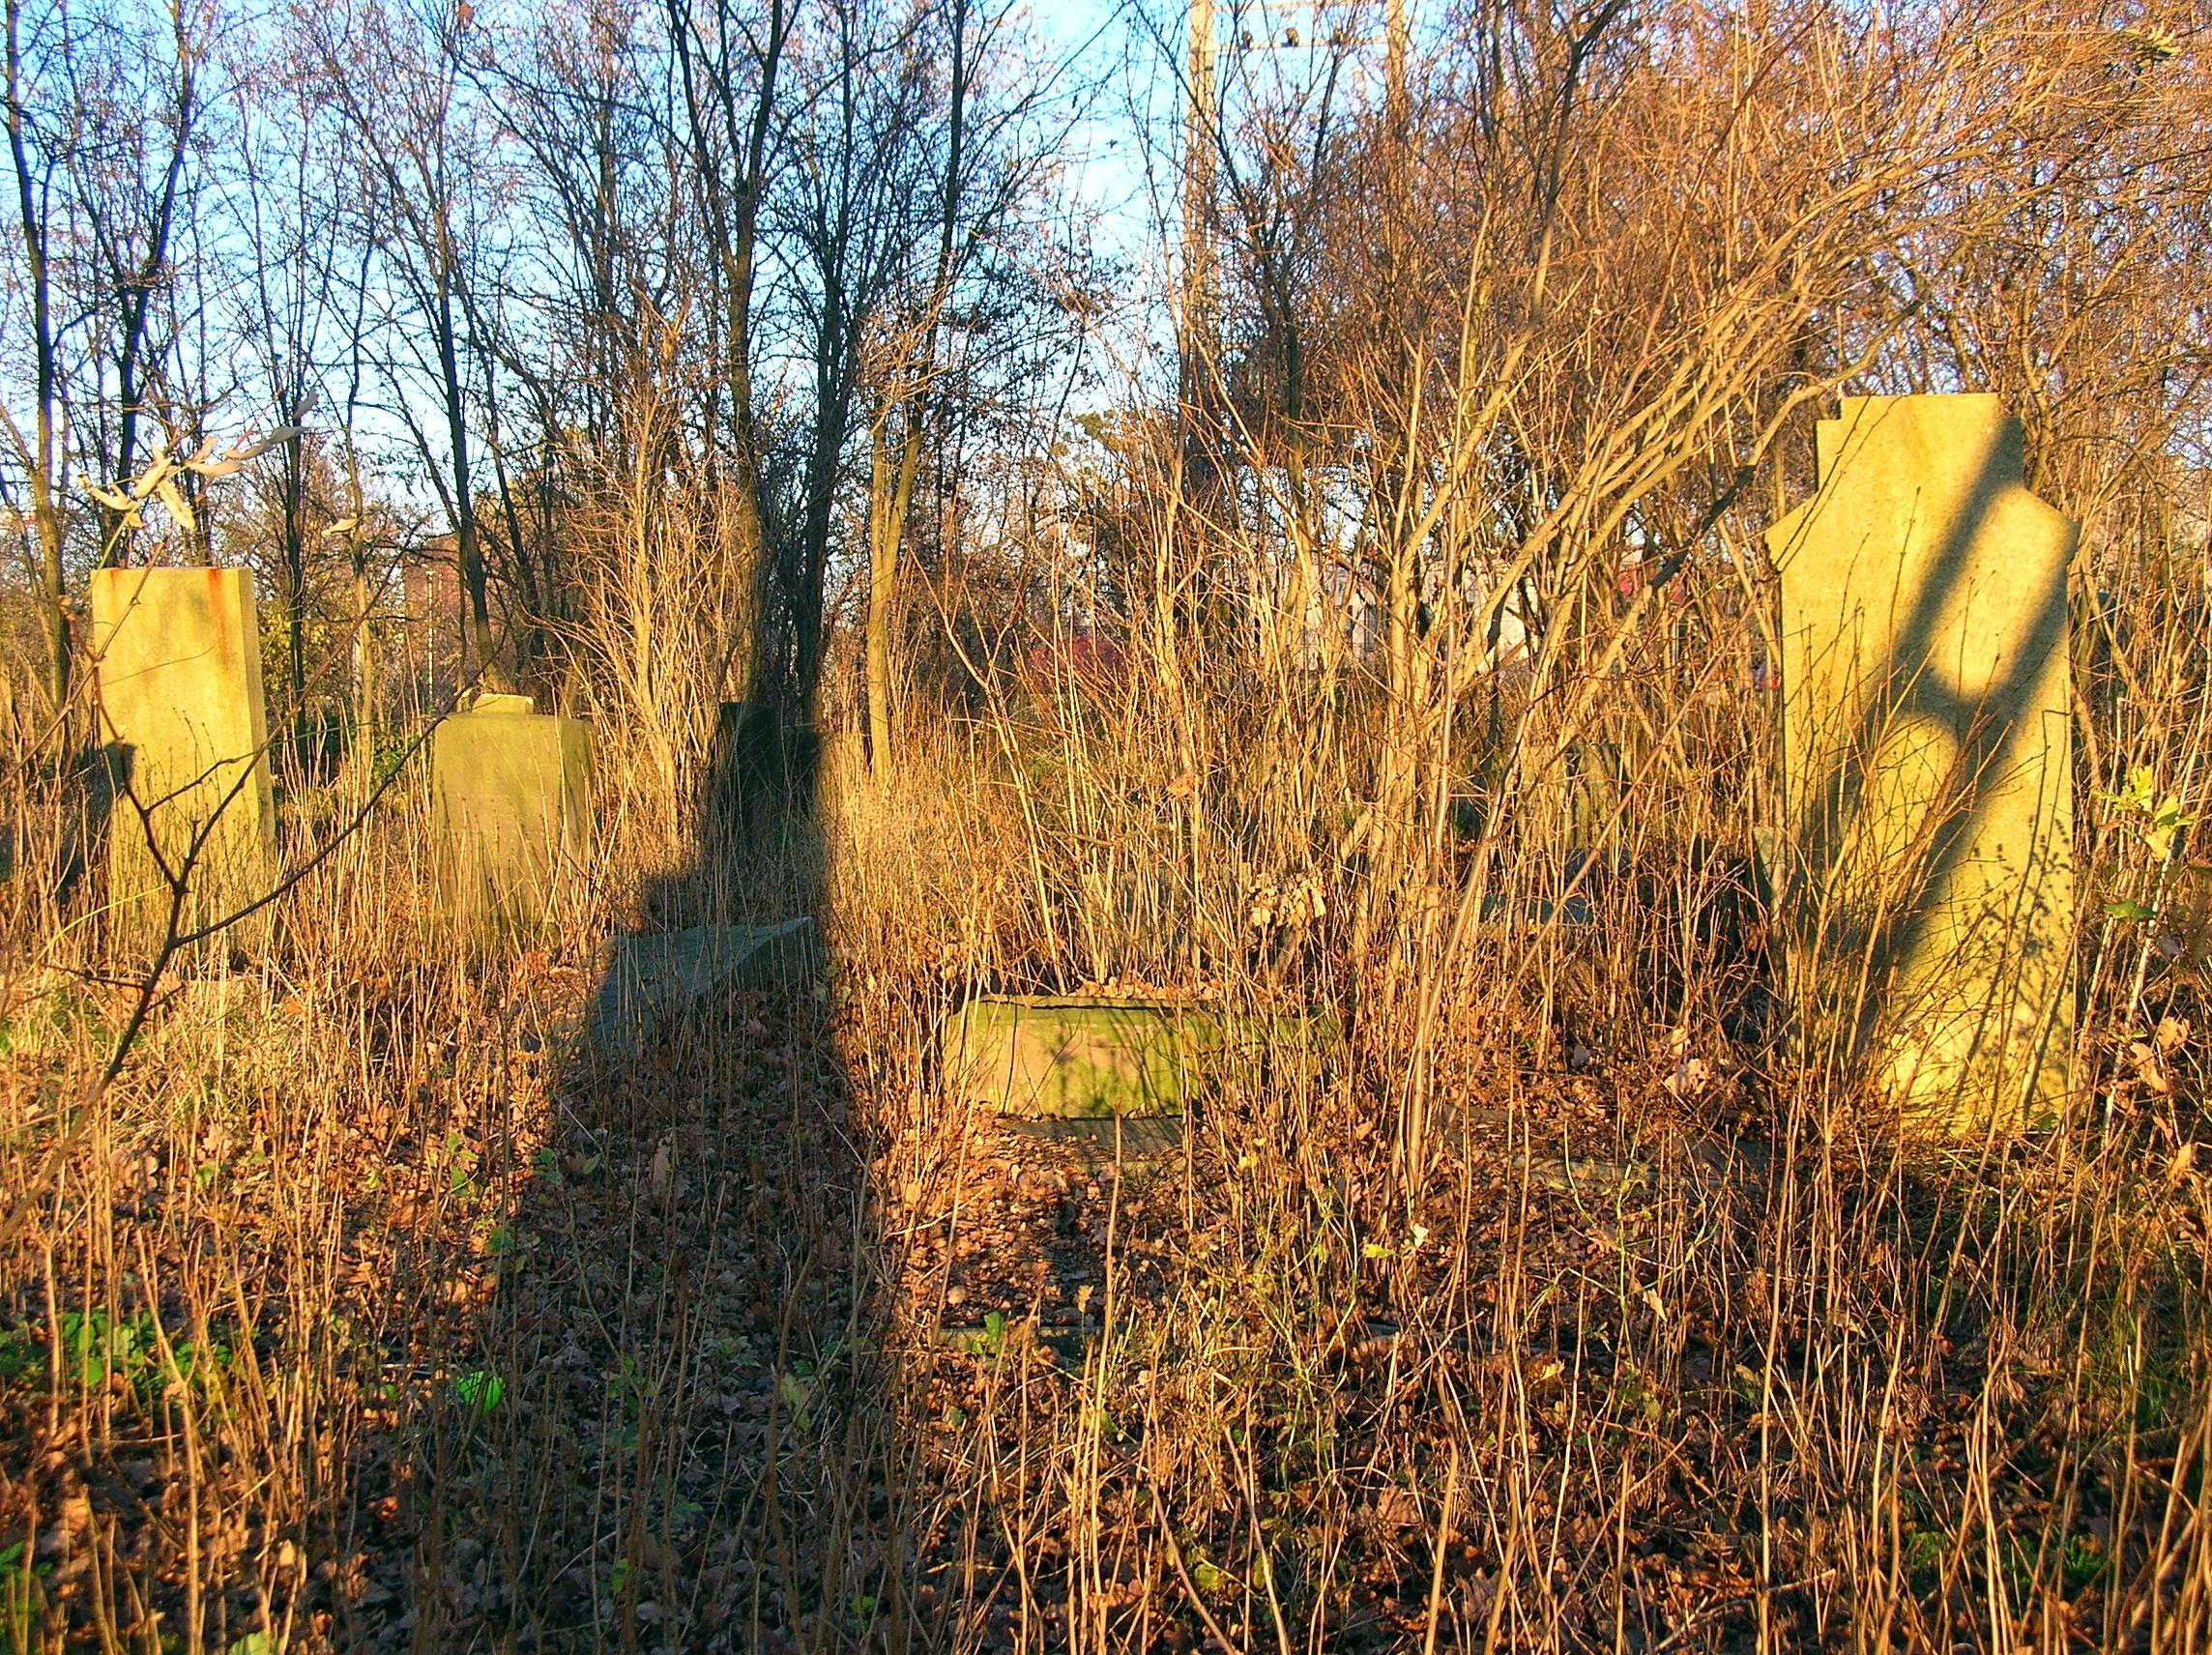 File:Jewish cemetery in Oława 163a.jpg - Wikimedia Commons